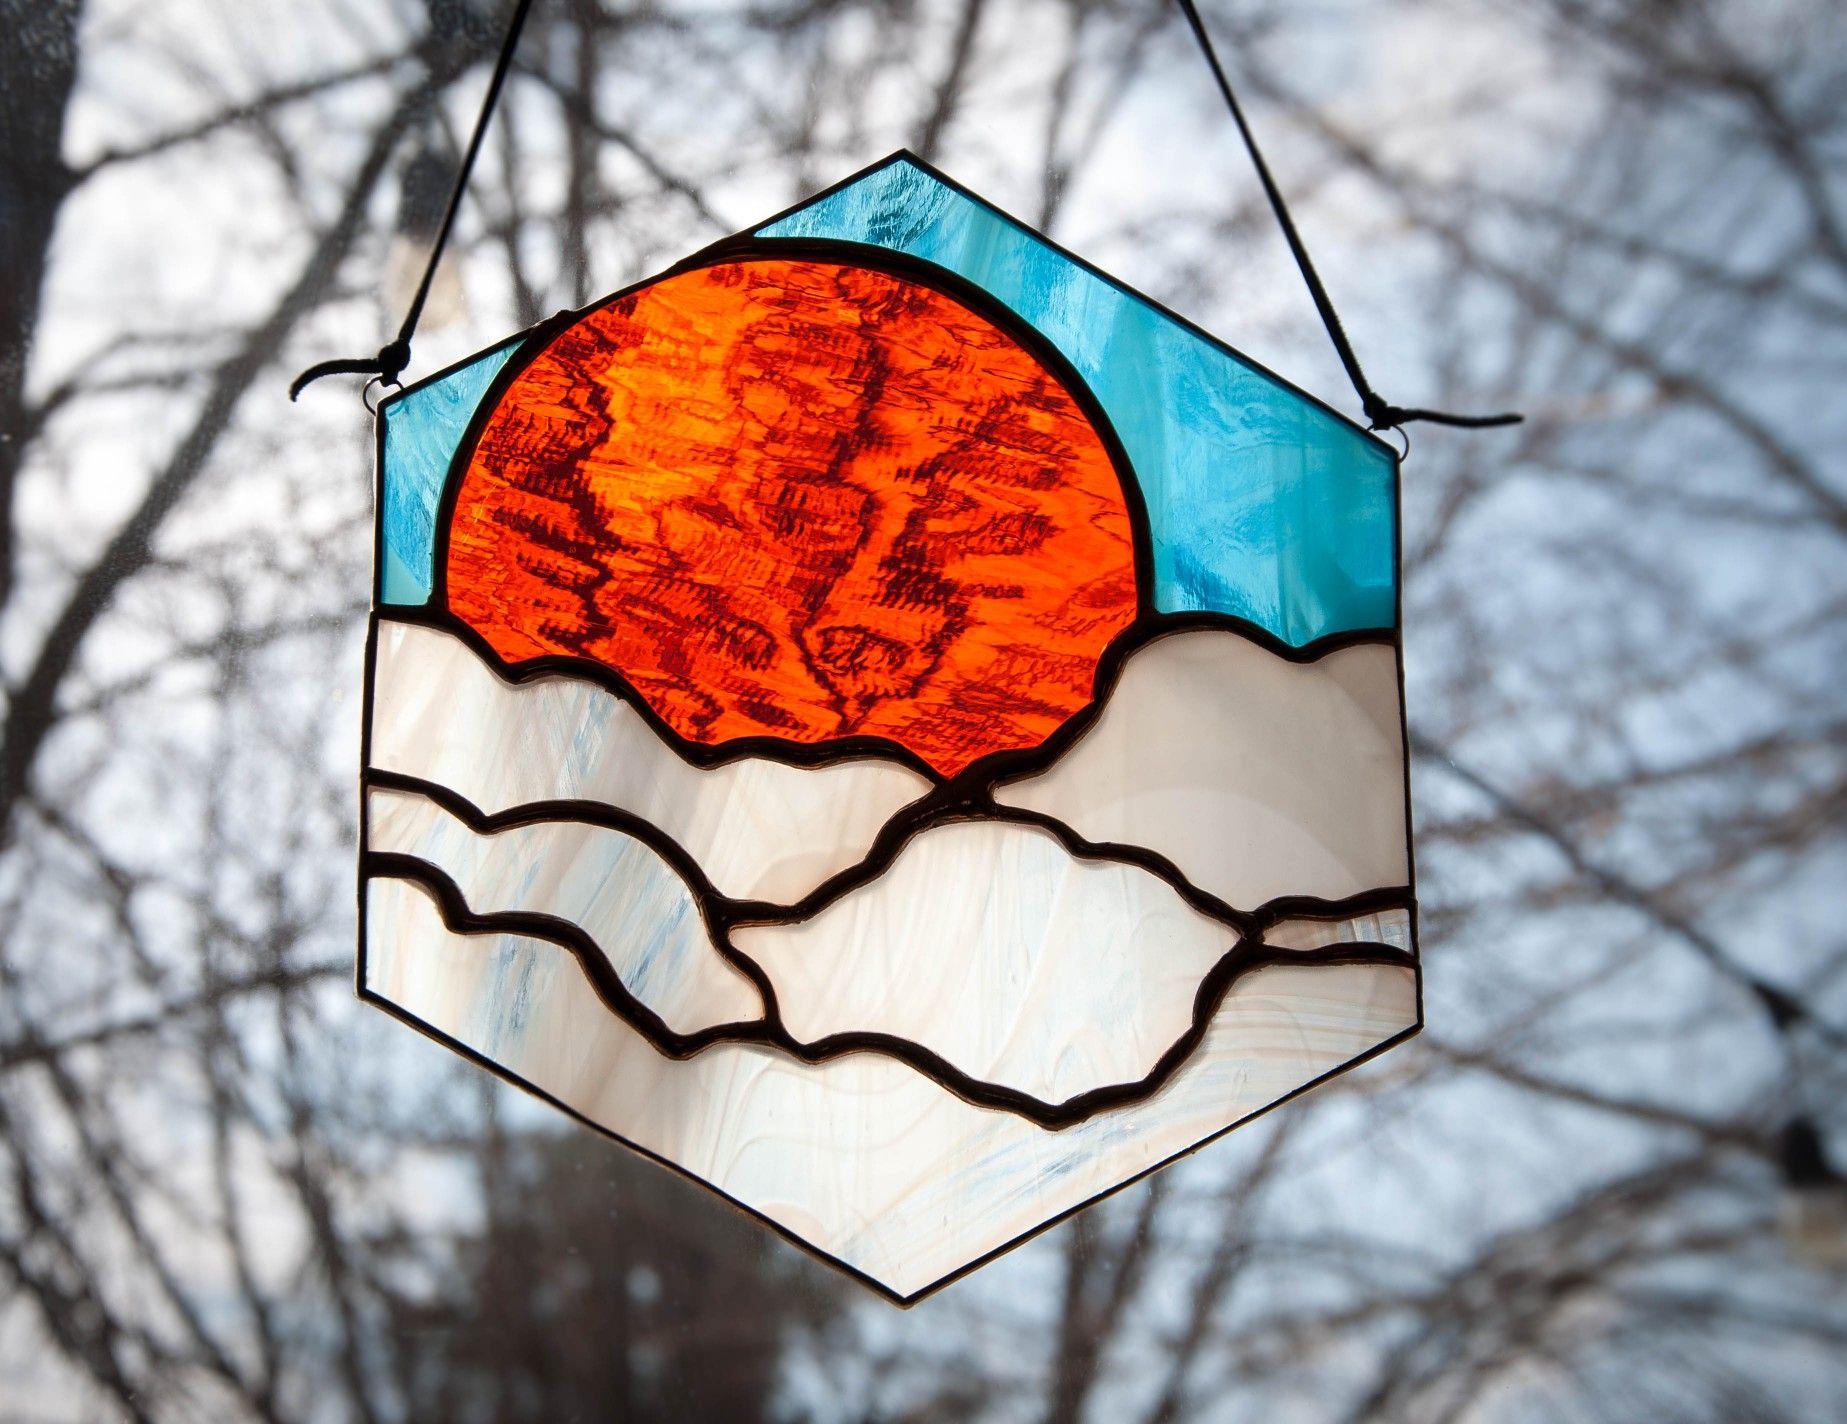 Sun In The Clouds Hexagon Shaped Suncatcher In 2020 Glass Window